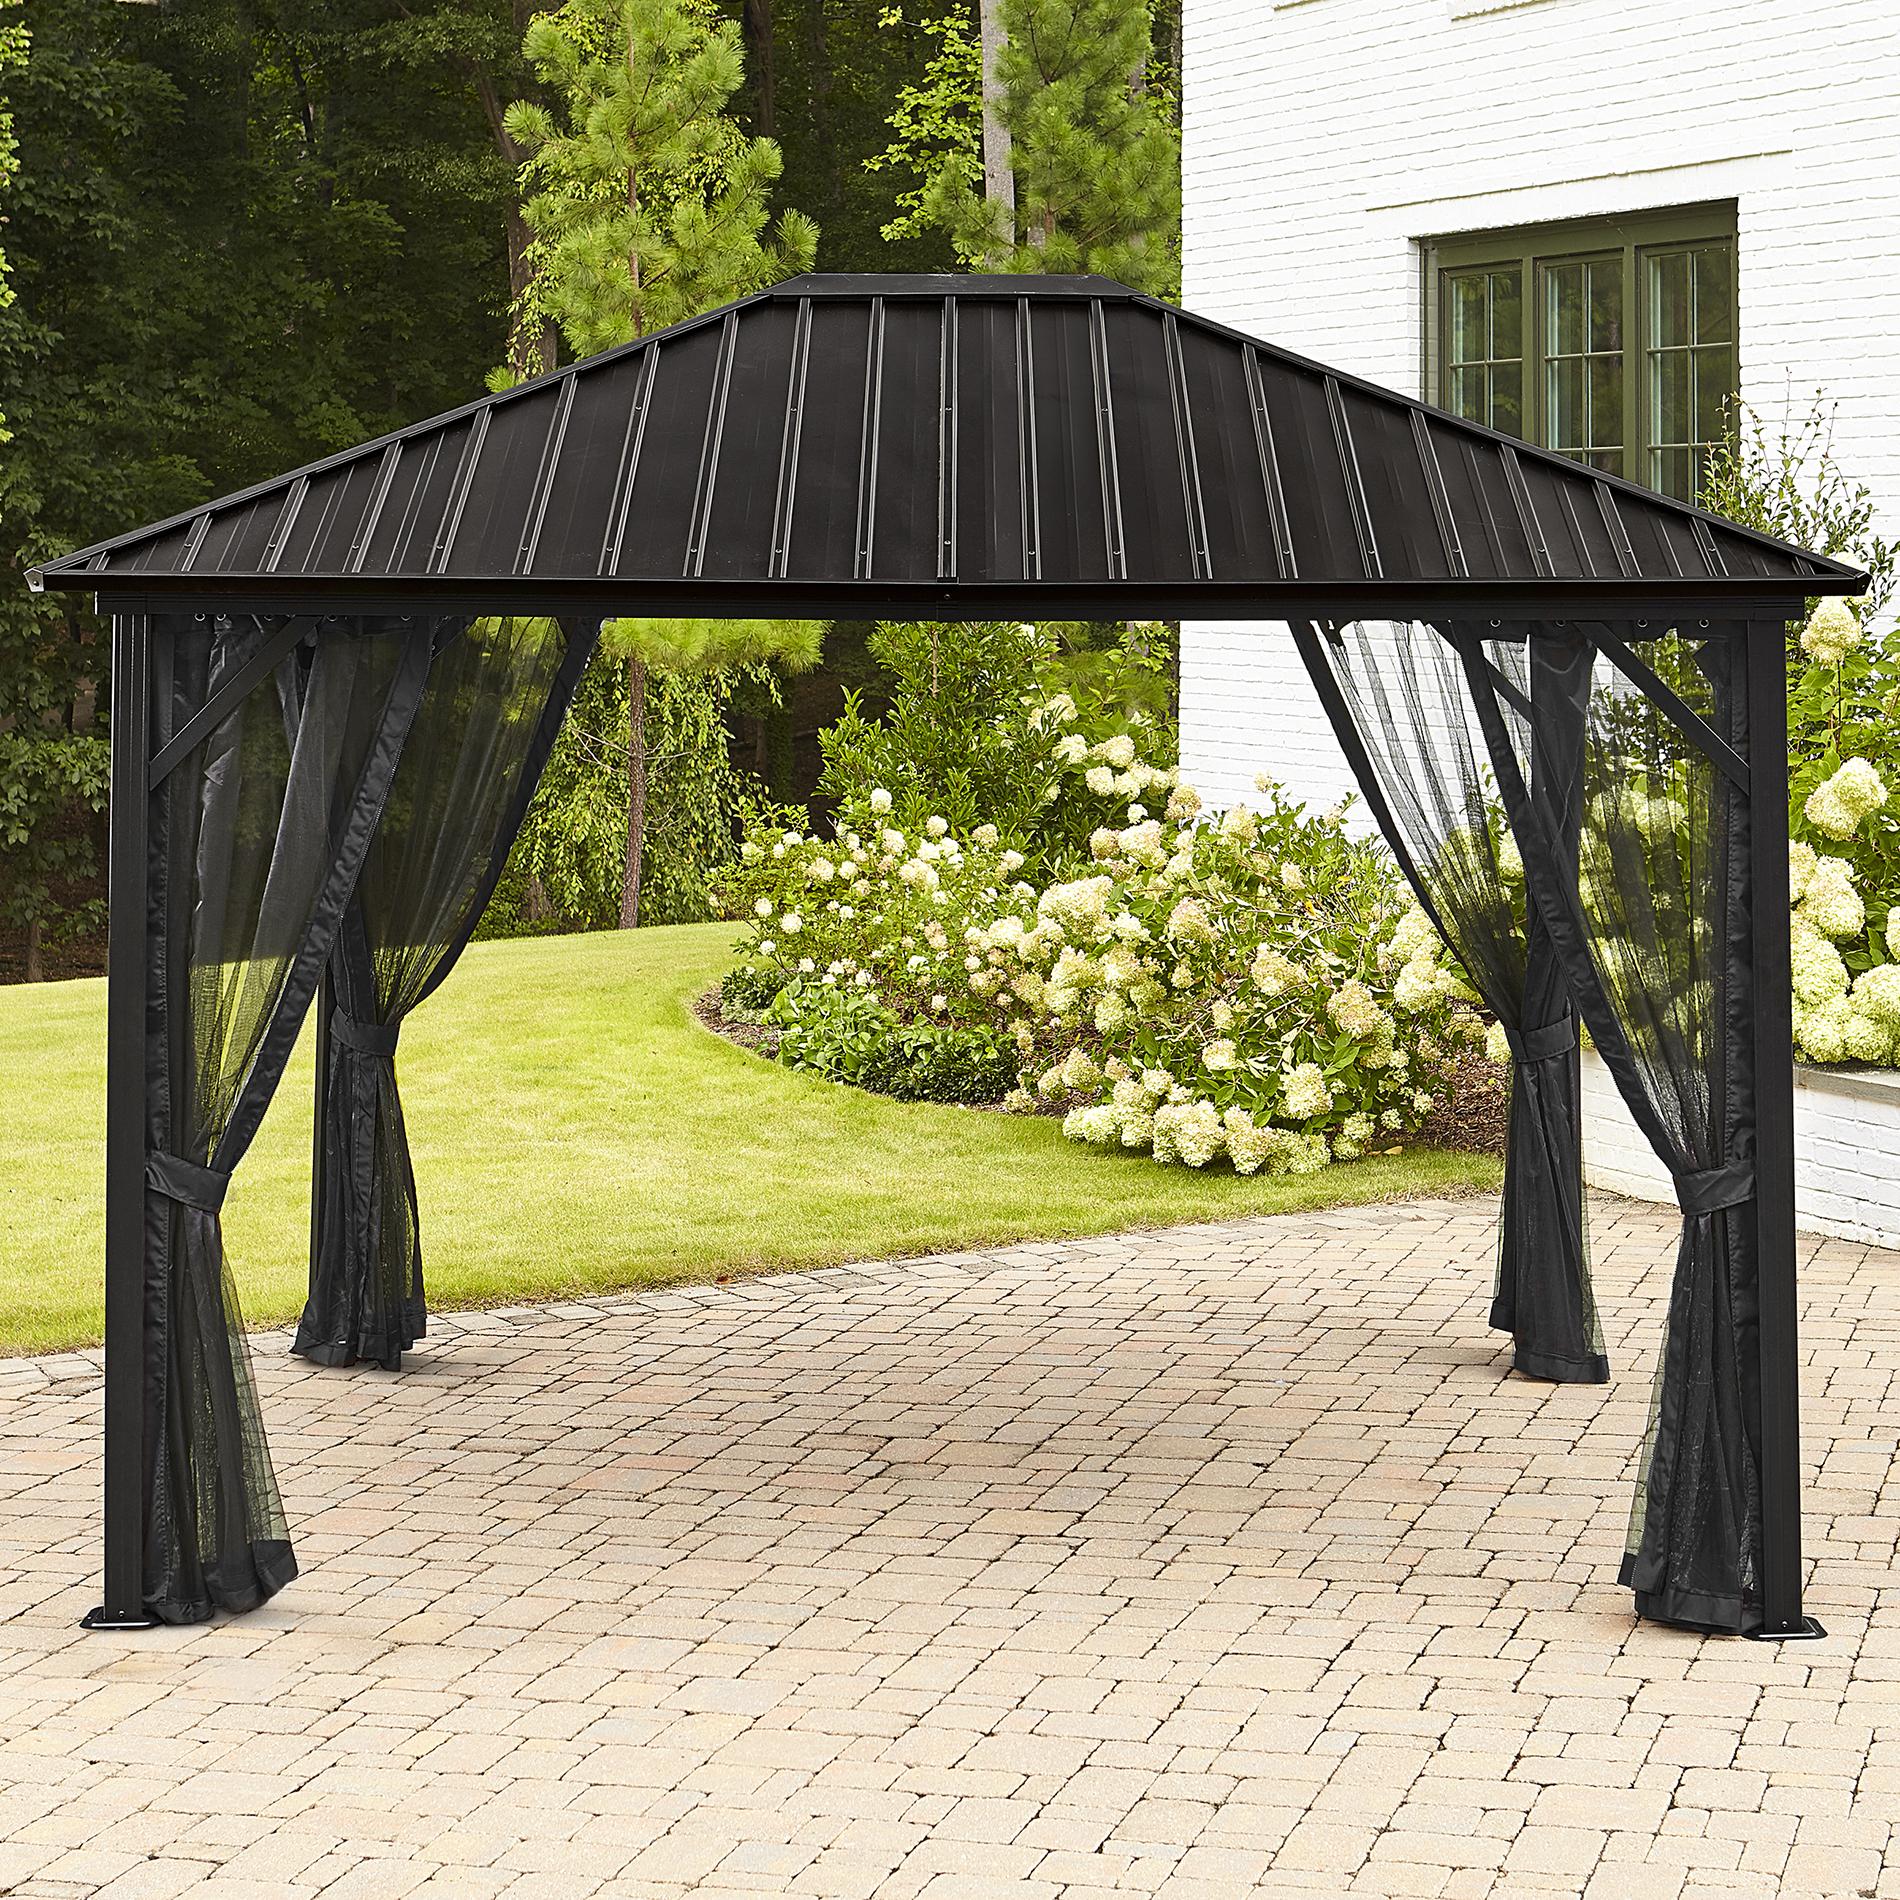 Image of Grand Resort Lake Geneva Steel Hardtop Gazebo - Set Up Your Own Cocoon, Black